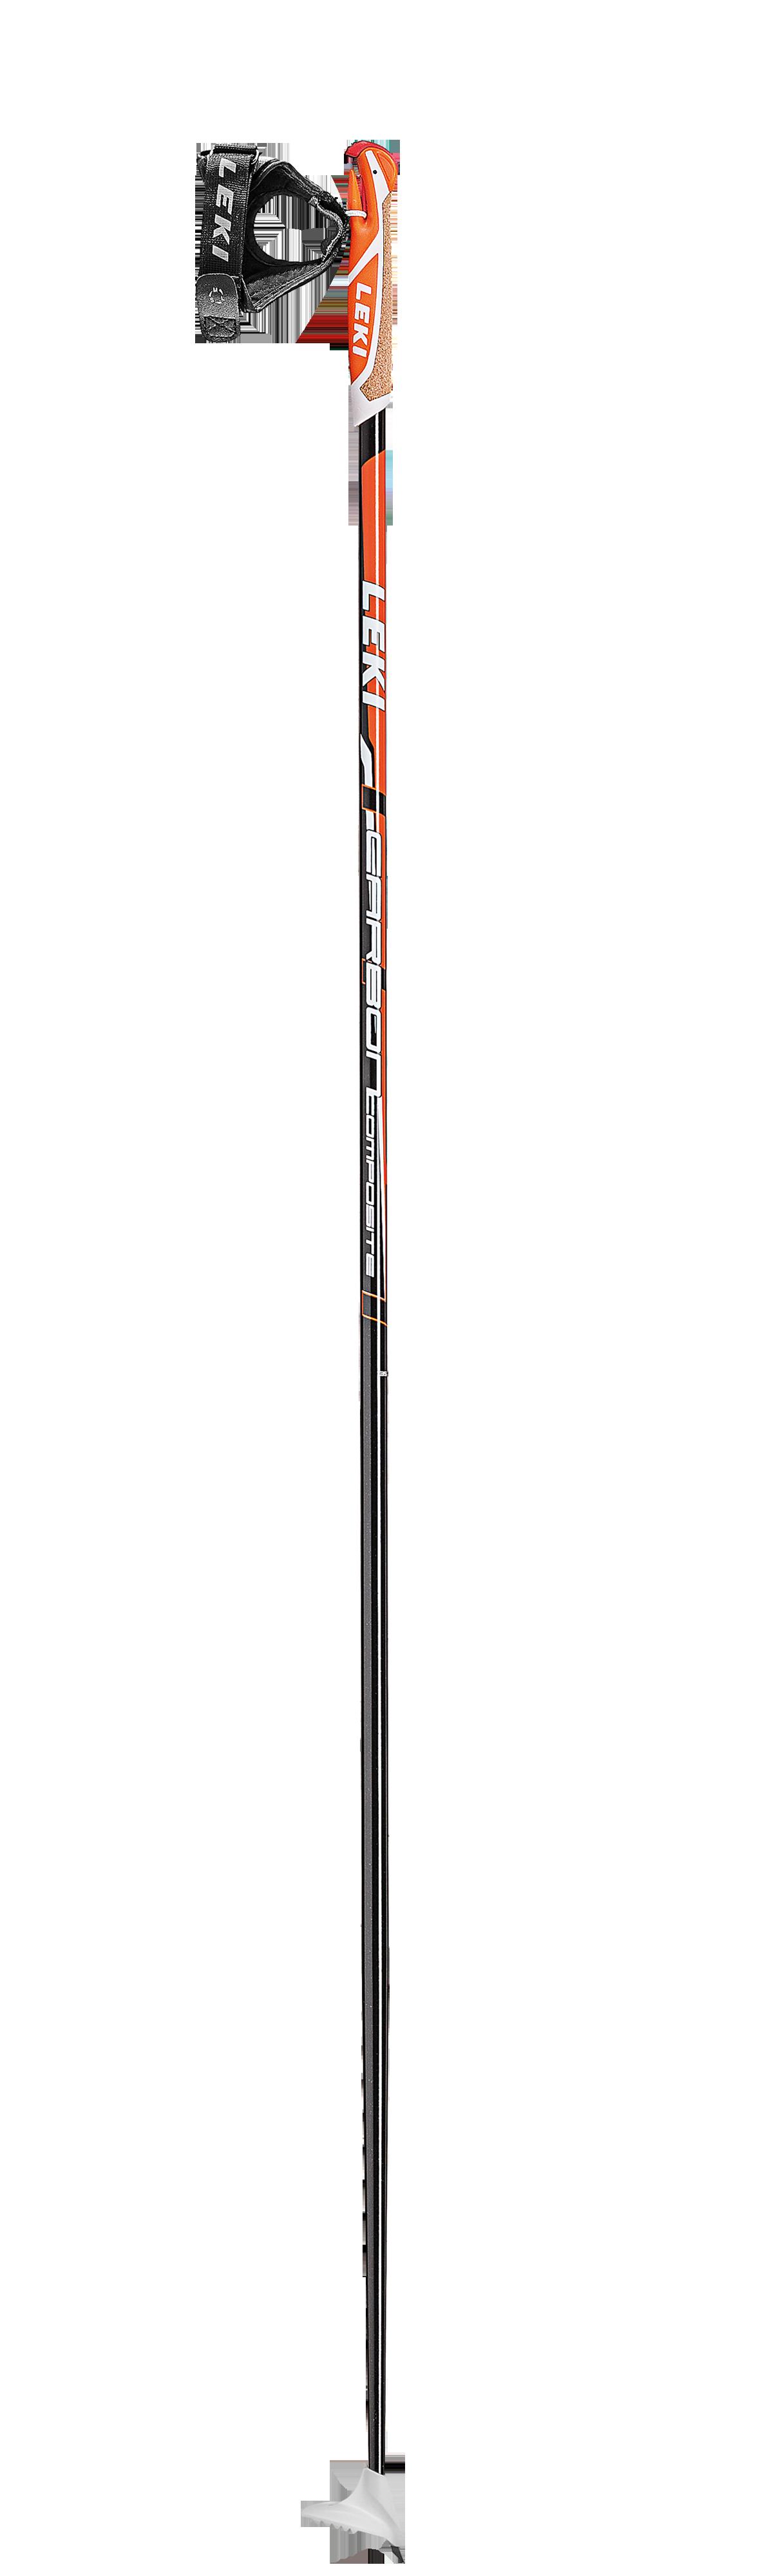 Skistöcke Carbon Comp